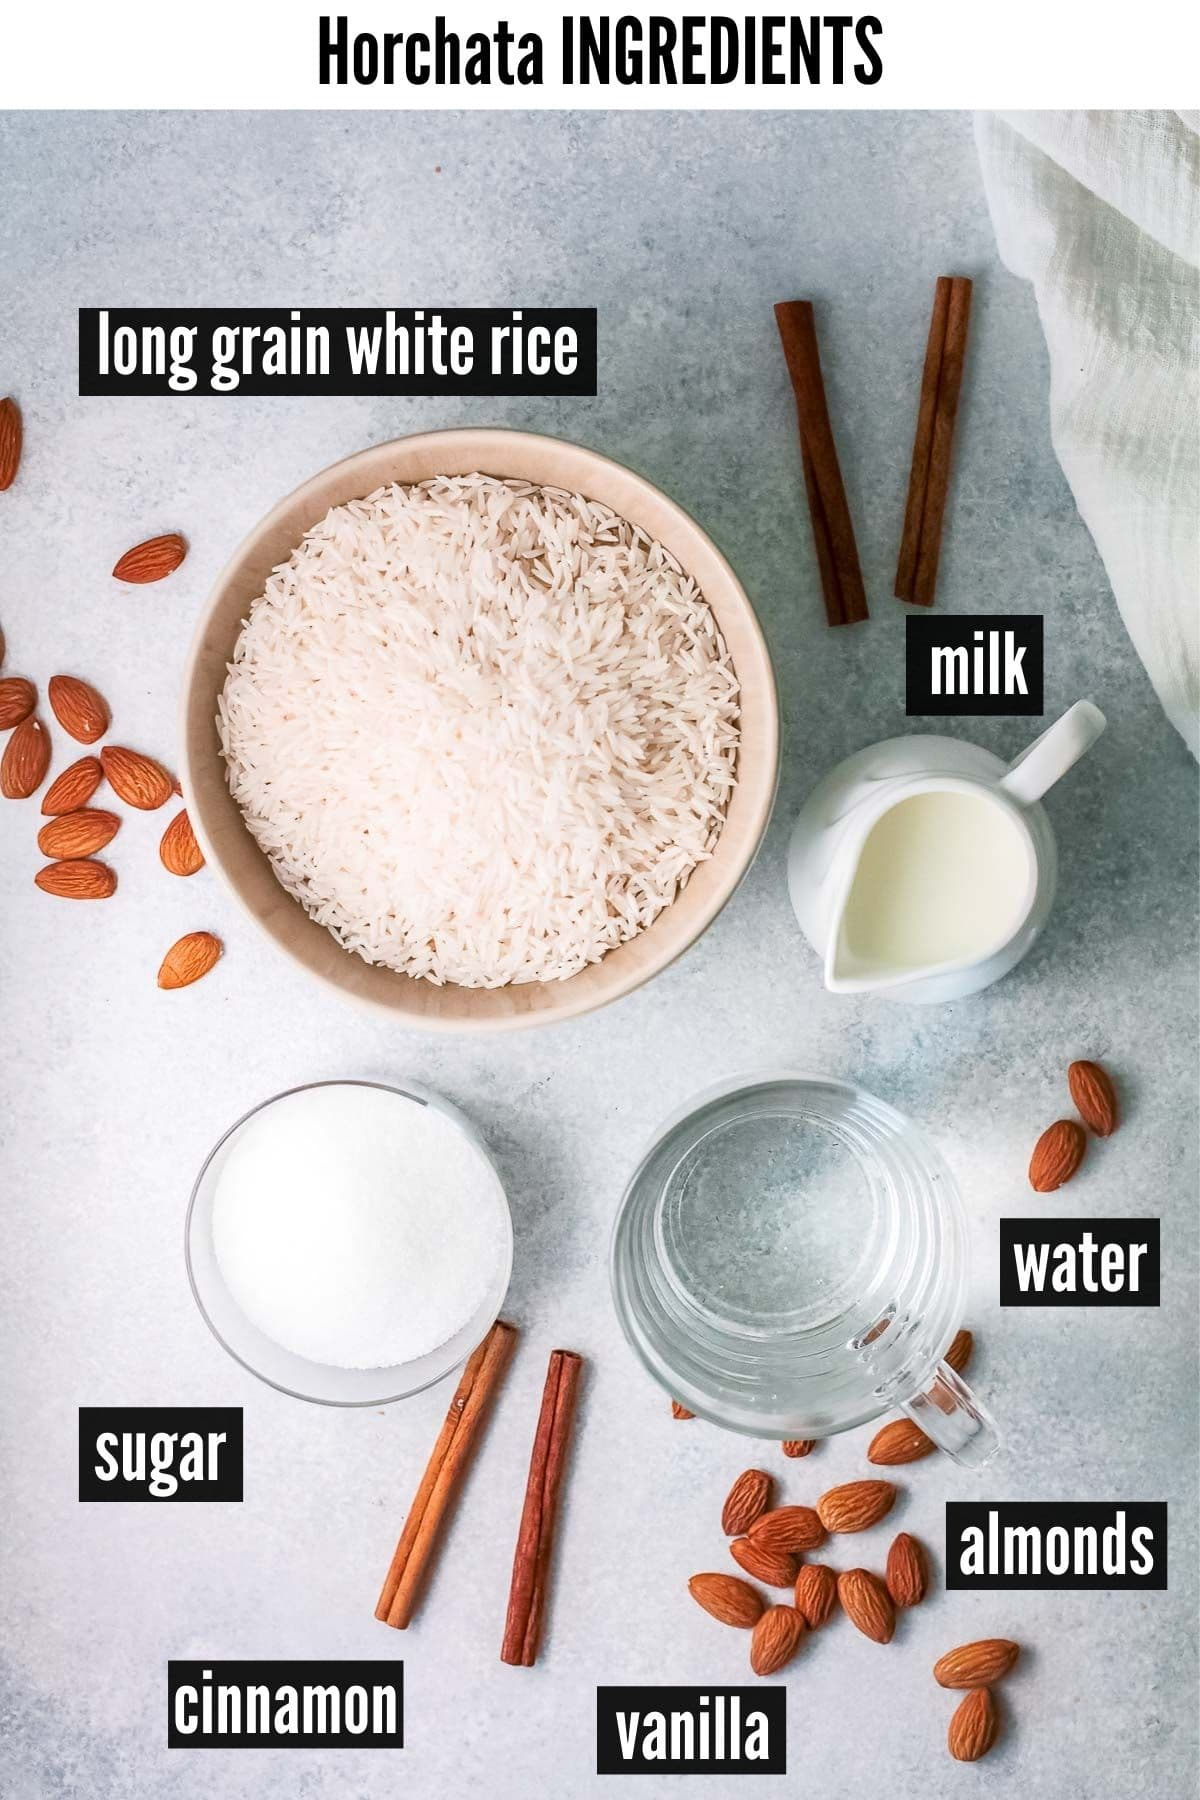 horchata ingredients